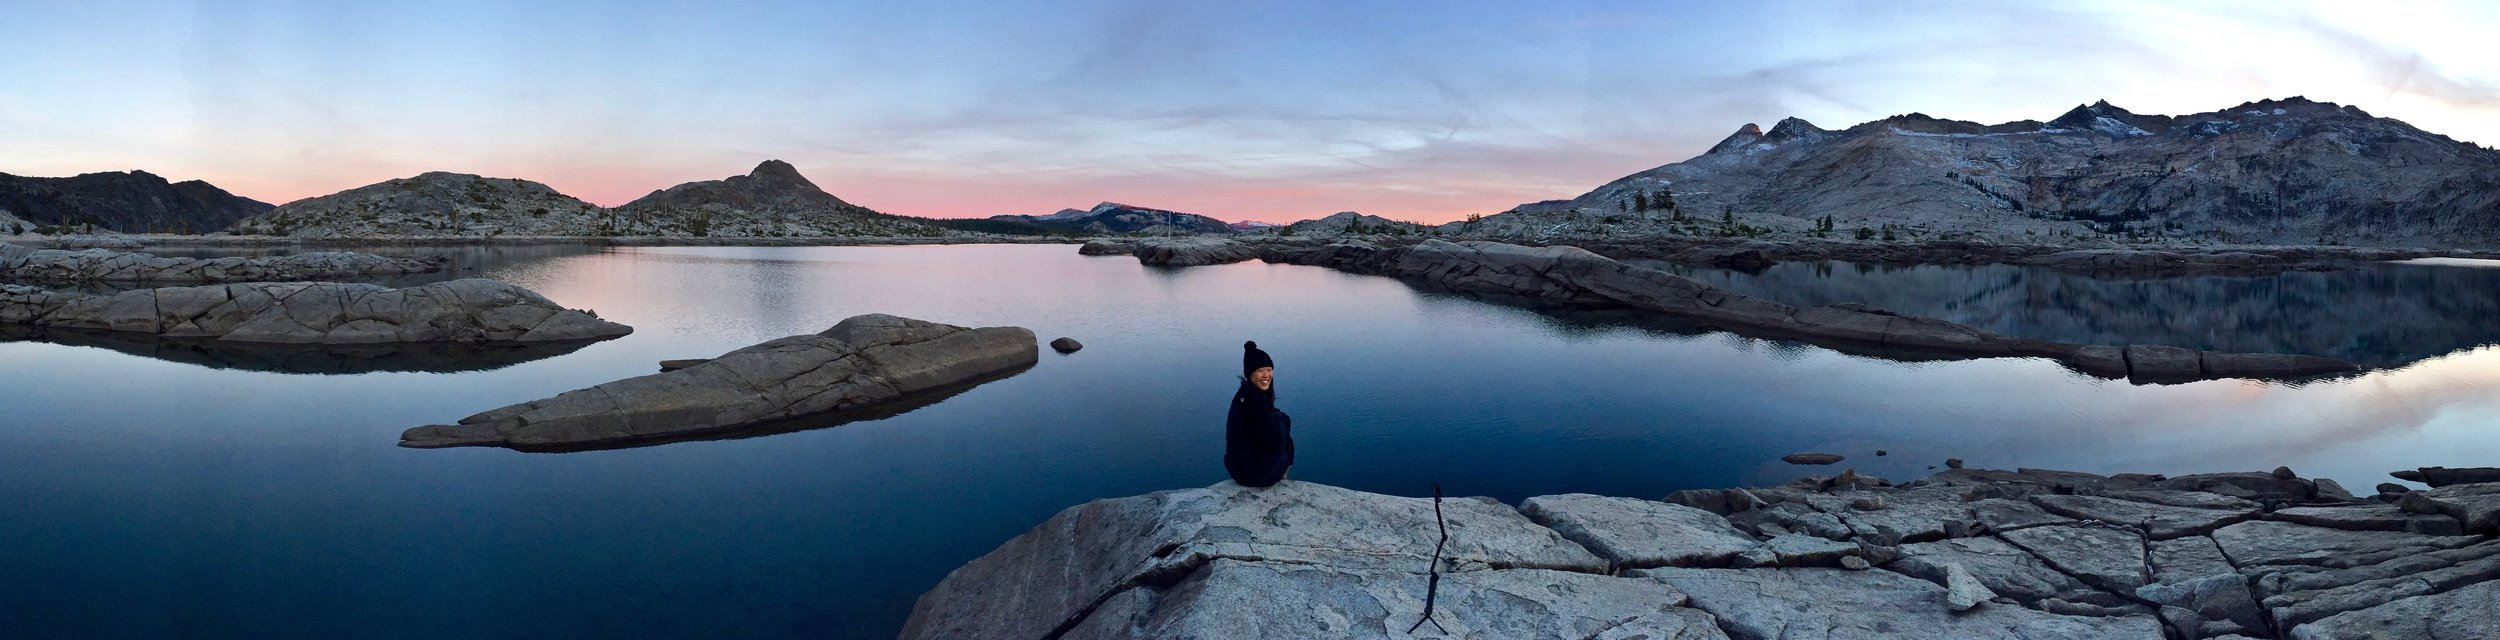 sunset-lake-aloha-desolation-wilderness-backpacking-trip